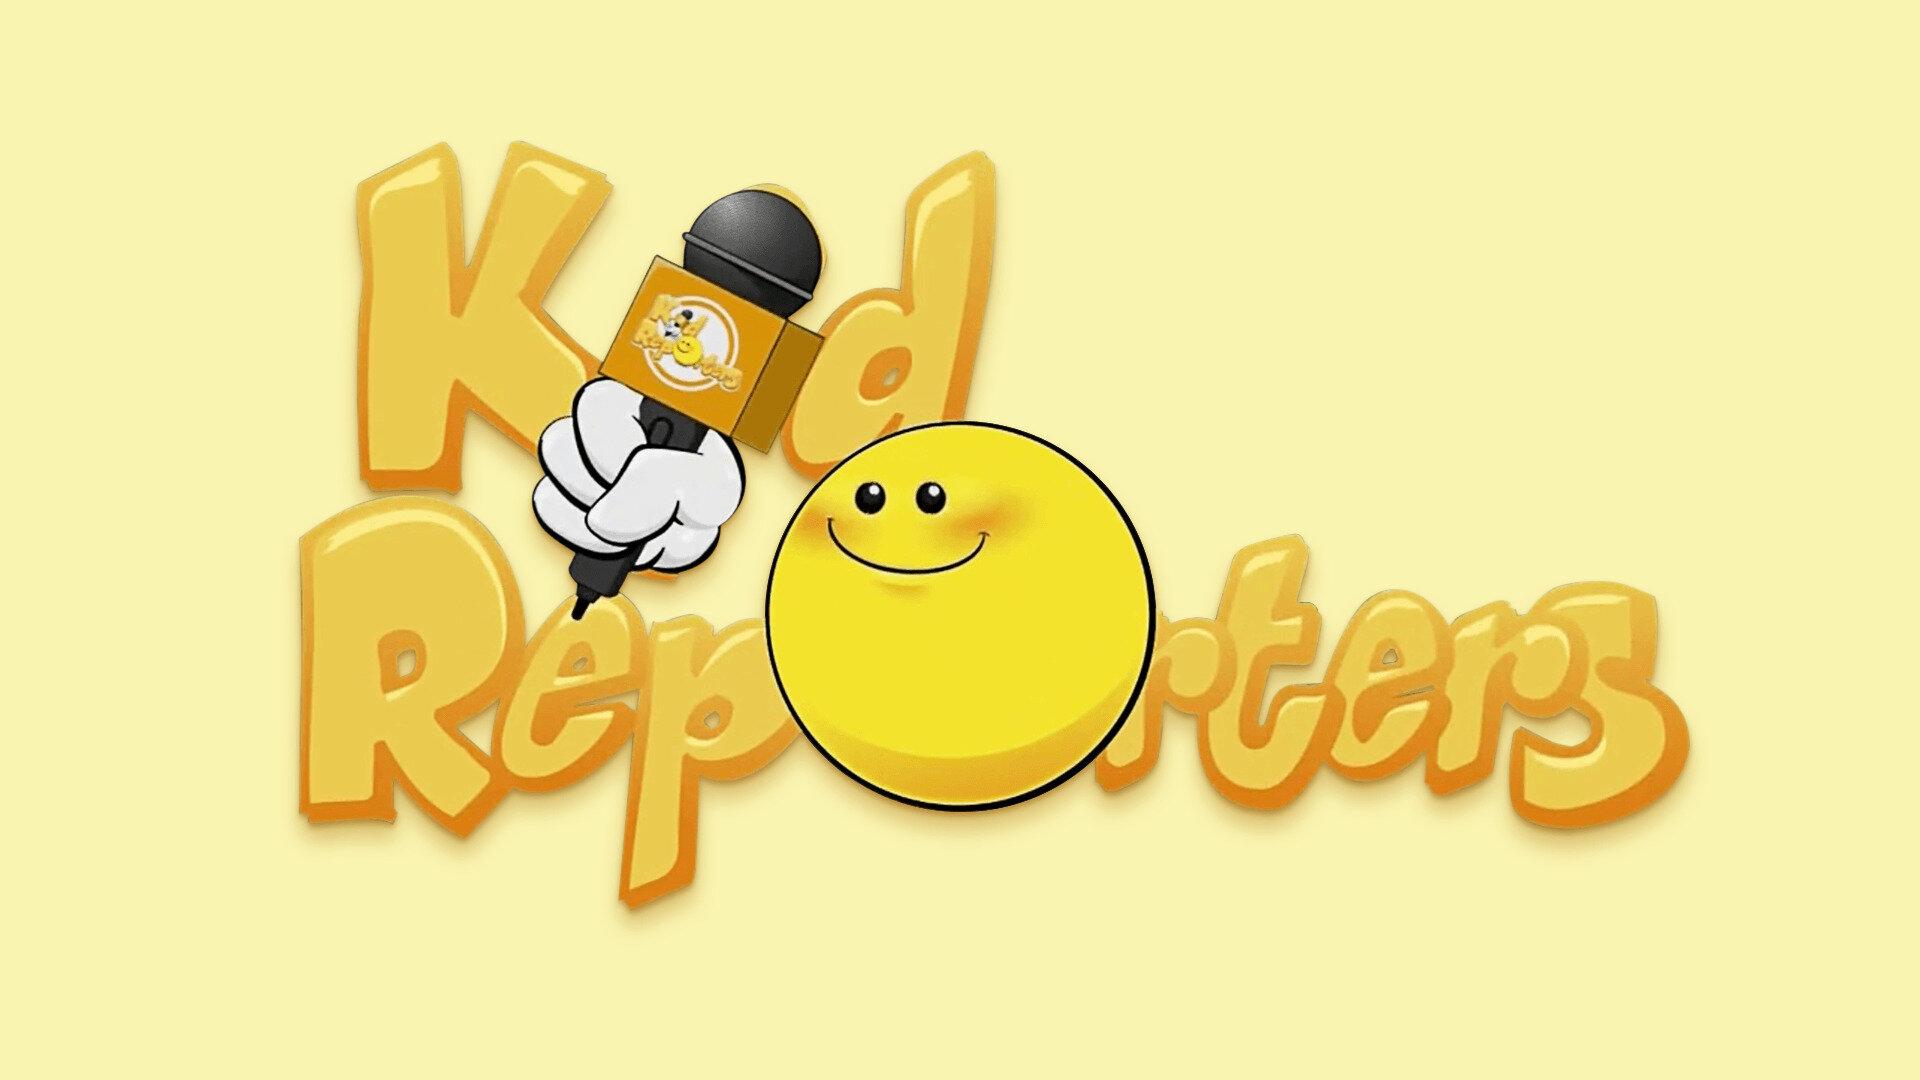 Kid reporters